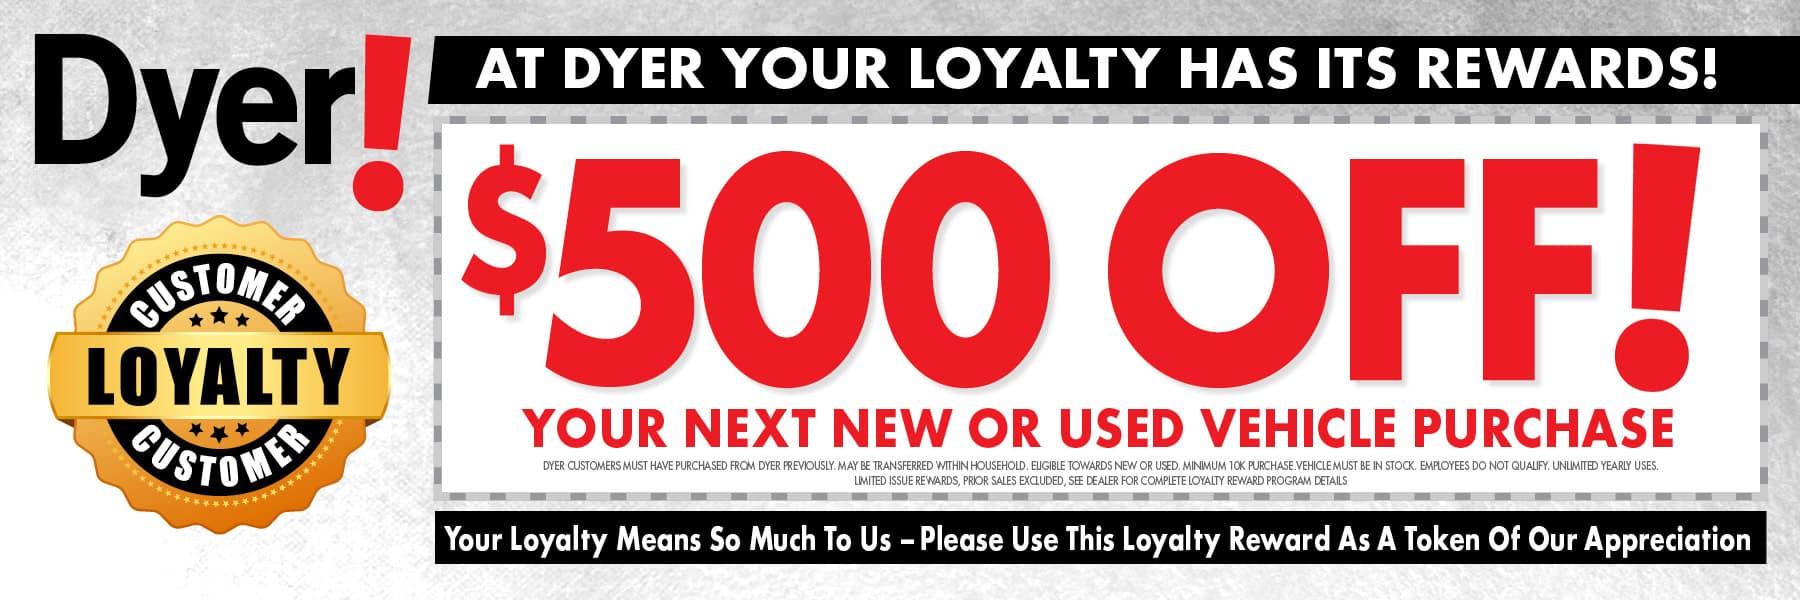 AD0549 DYER – HERO 1800X600- Loyalty (1)